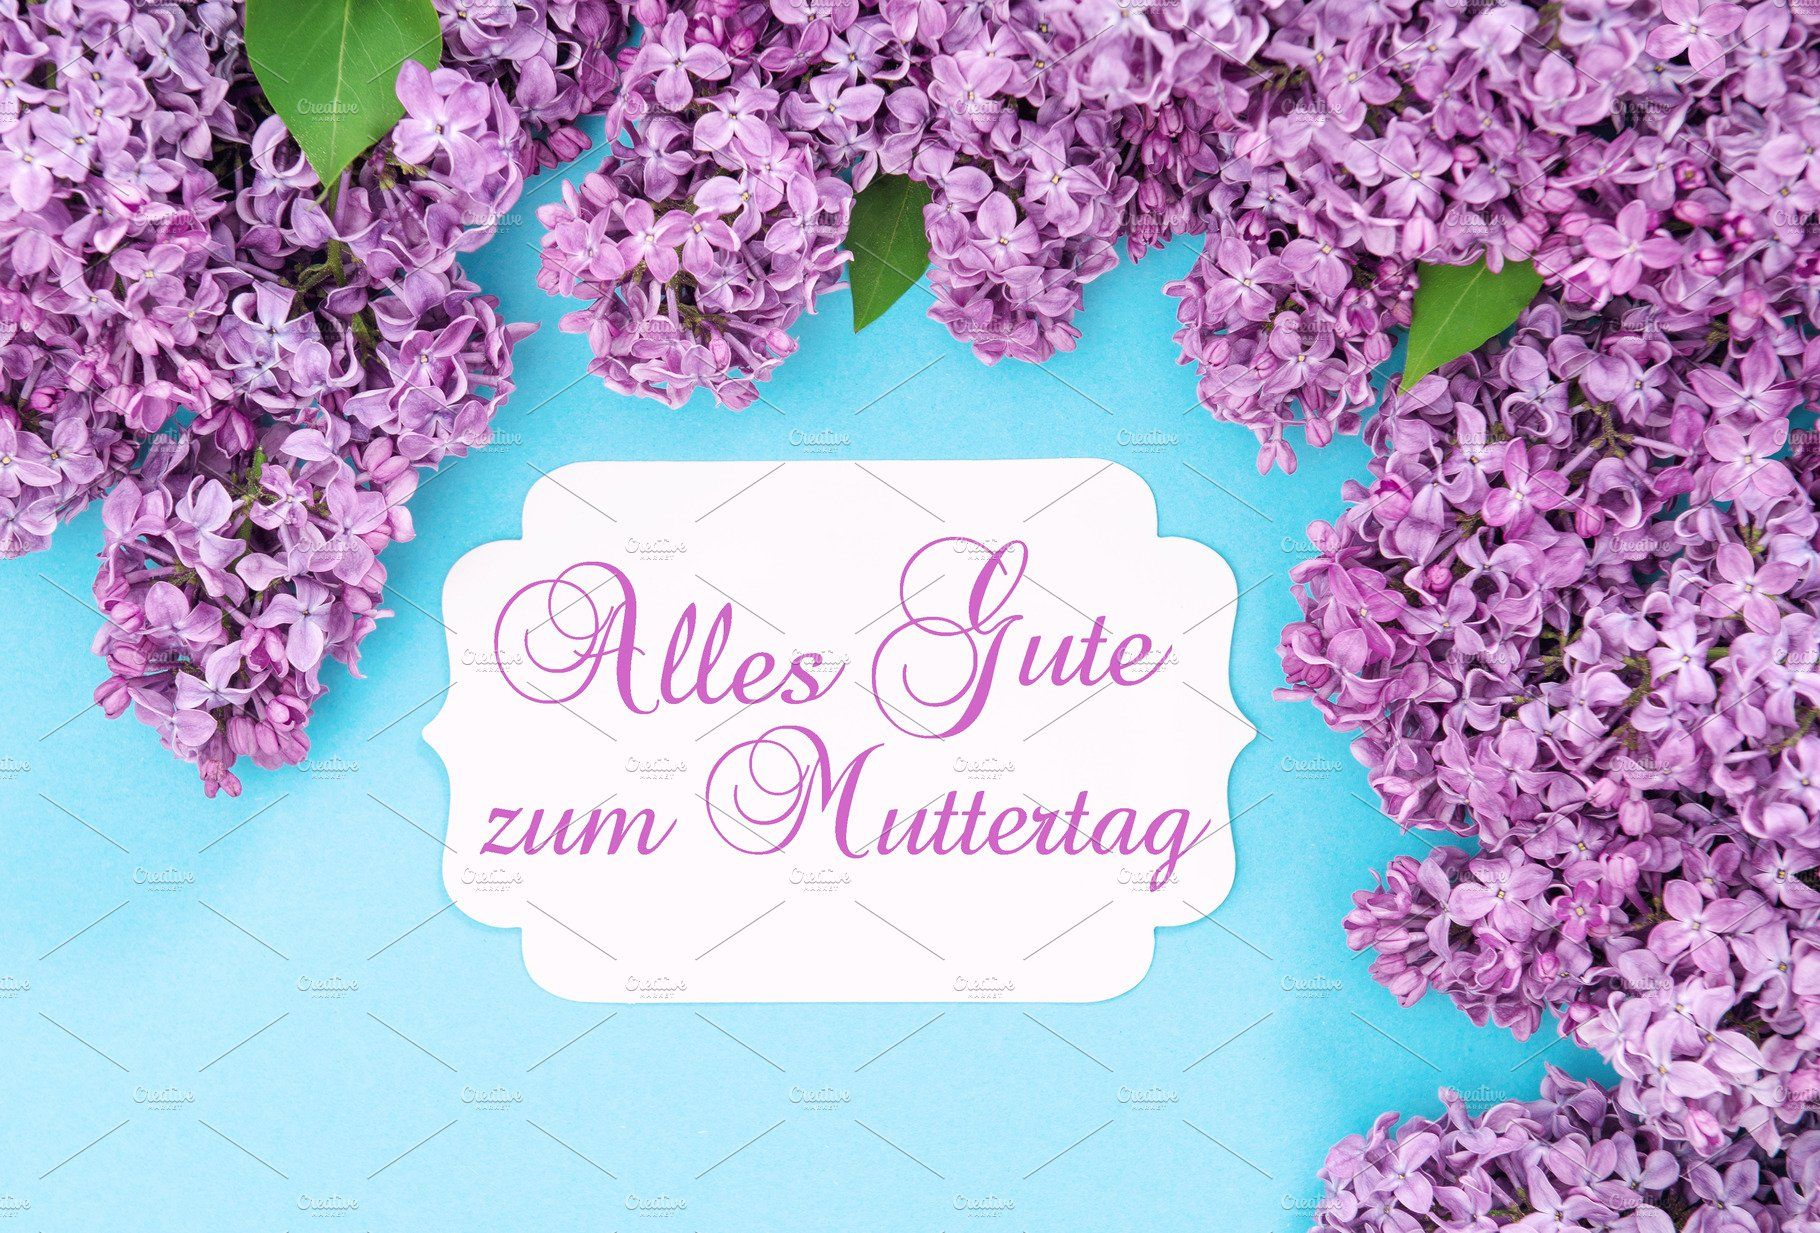 Lilac Flowers Greetings Card German In 2020 Lilac Flowers Greeting Cards Lilac